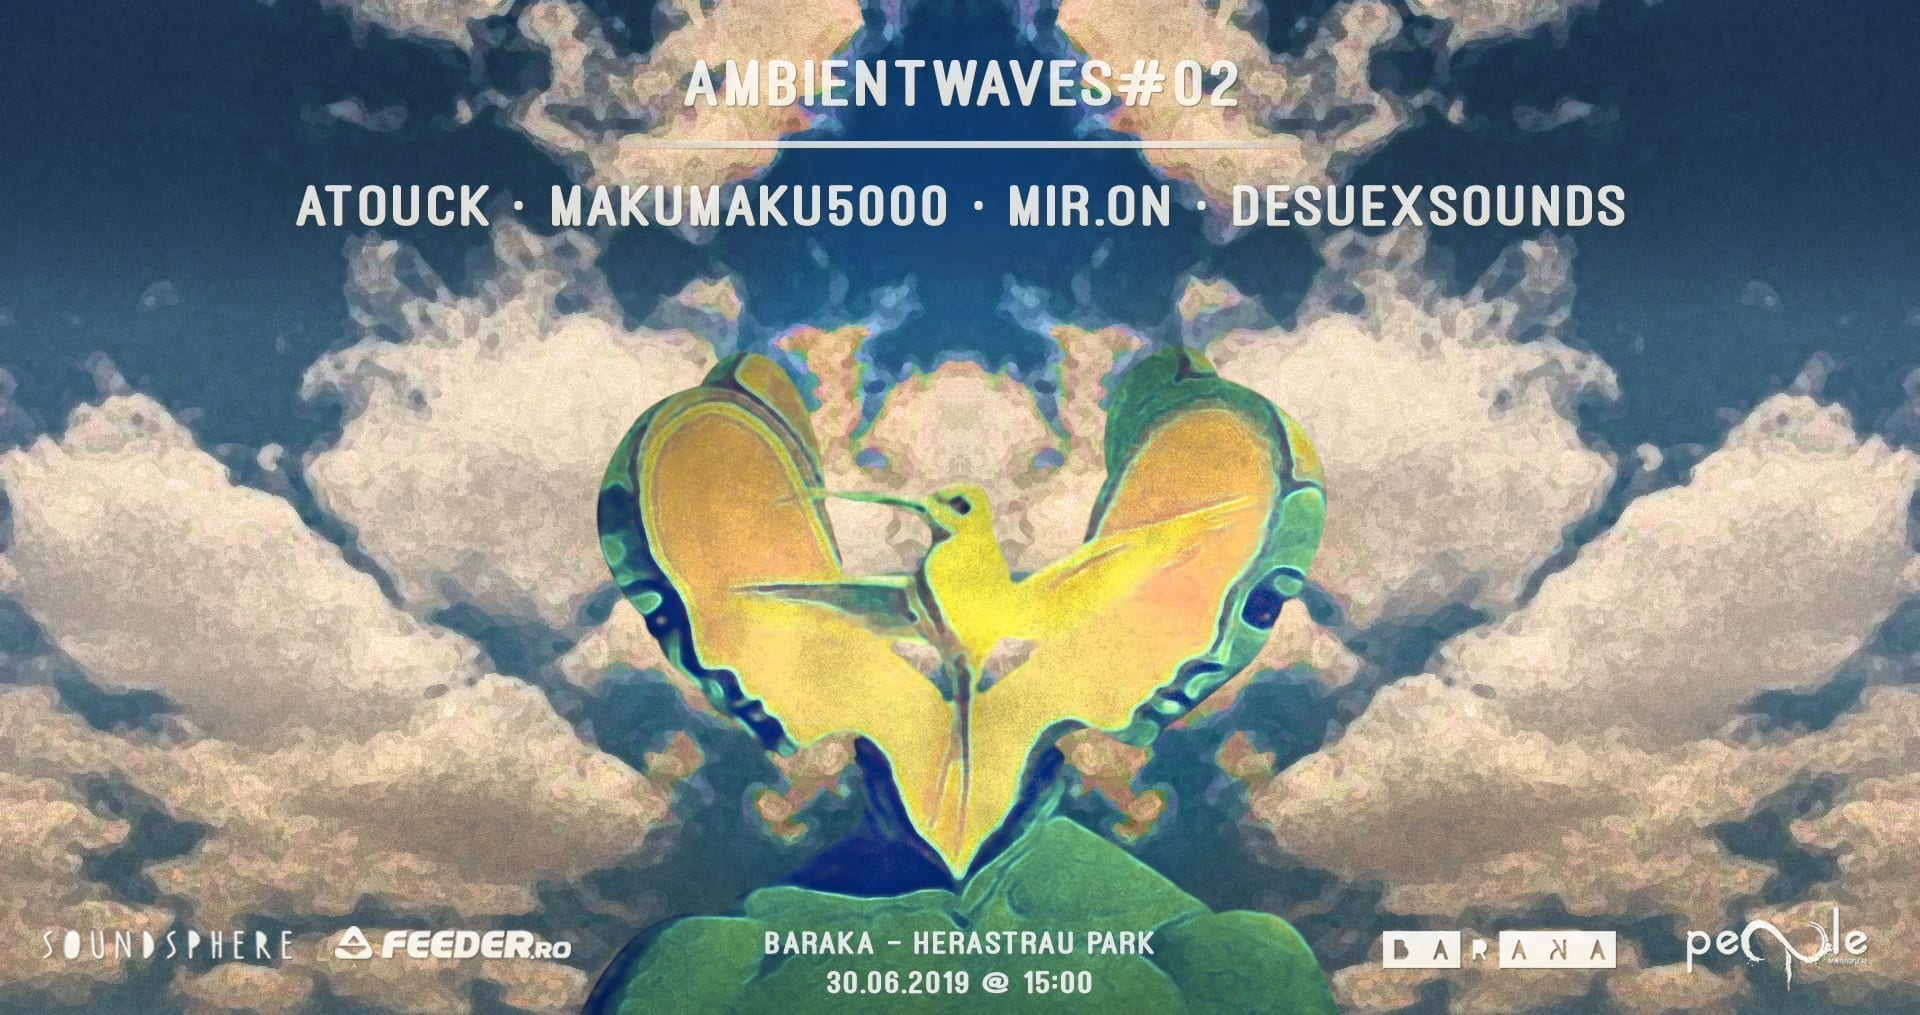 Soundsphere Ambientwaves #02 Baraka